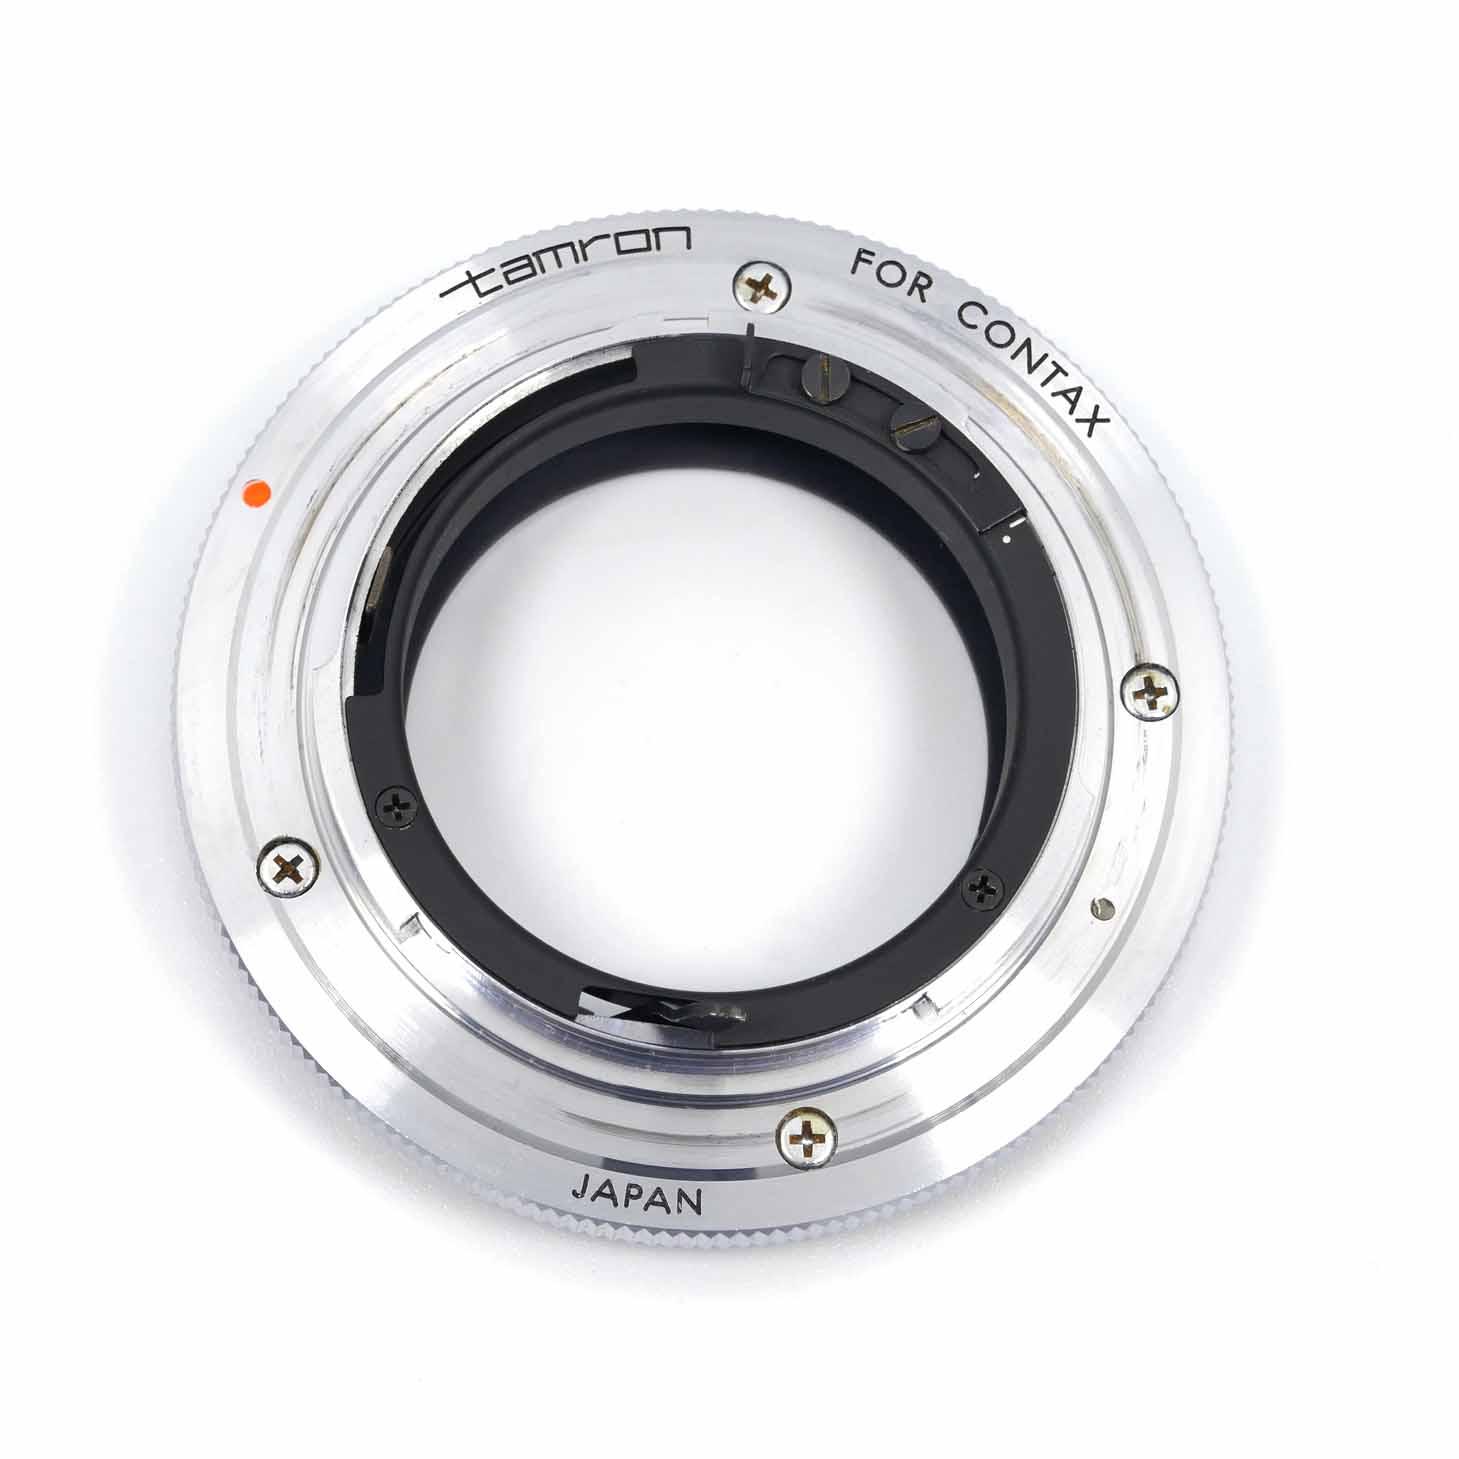 clean-cameras-Tamron-Adaptall-Contax-03